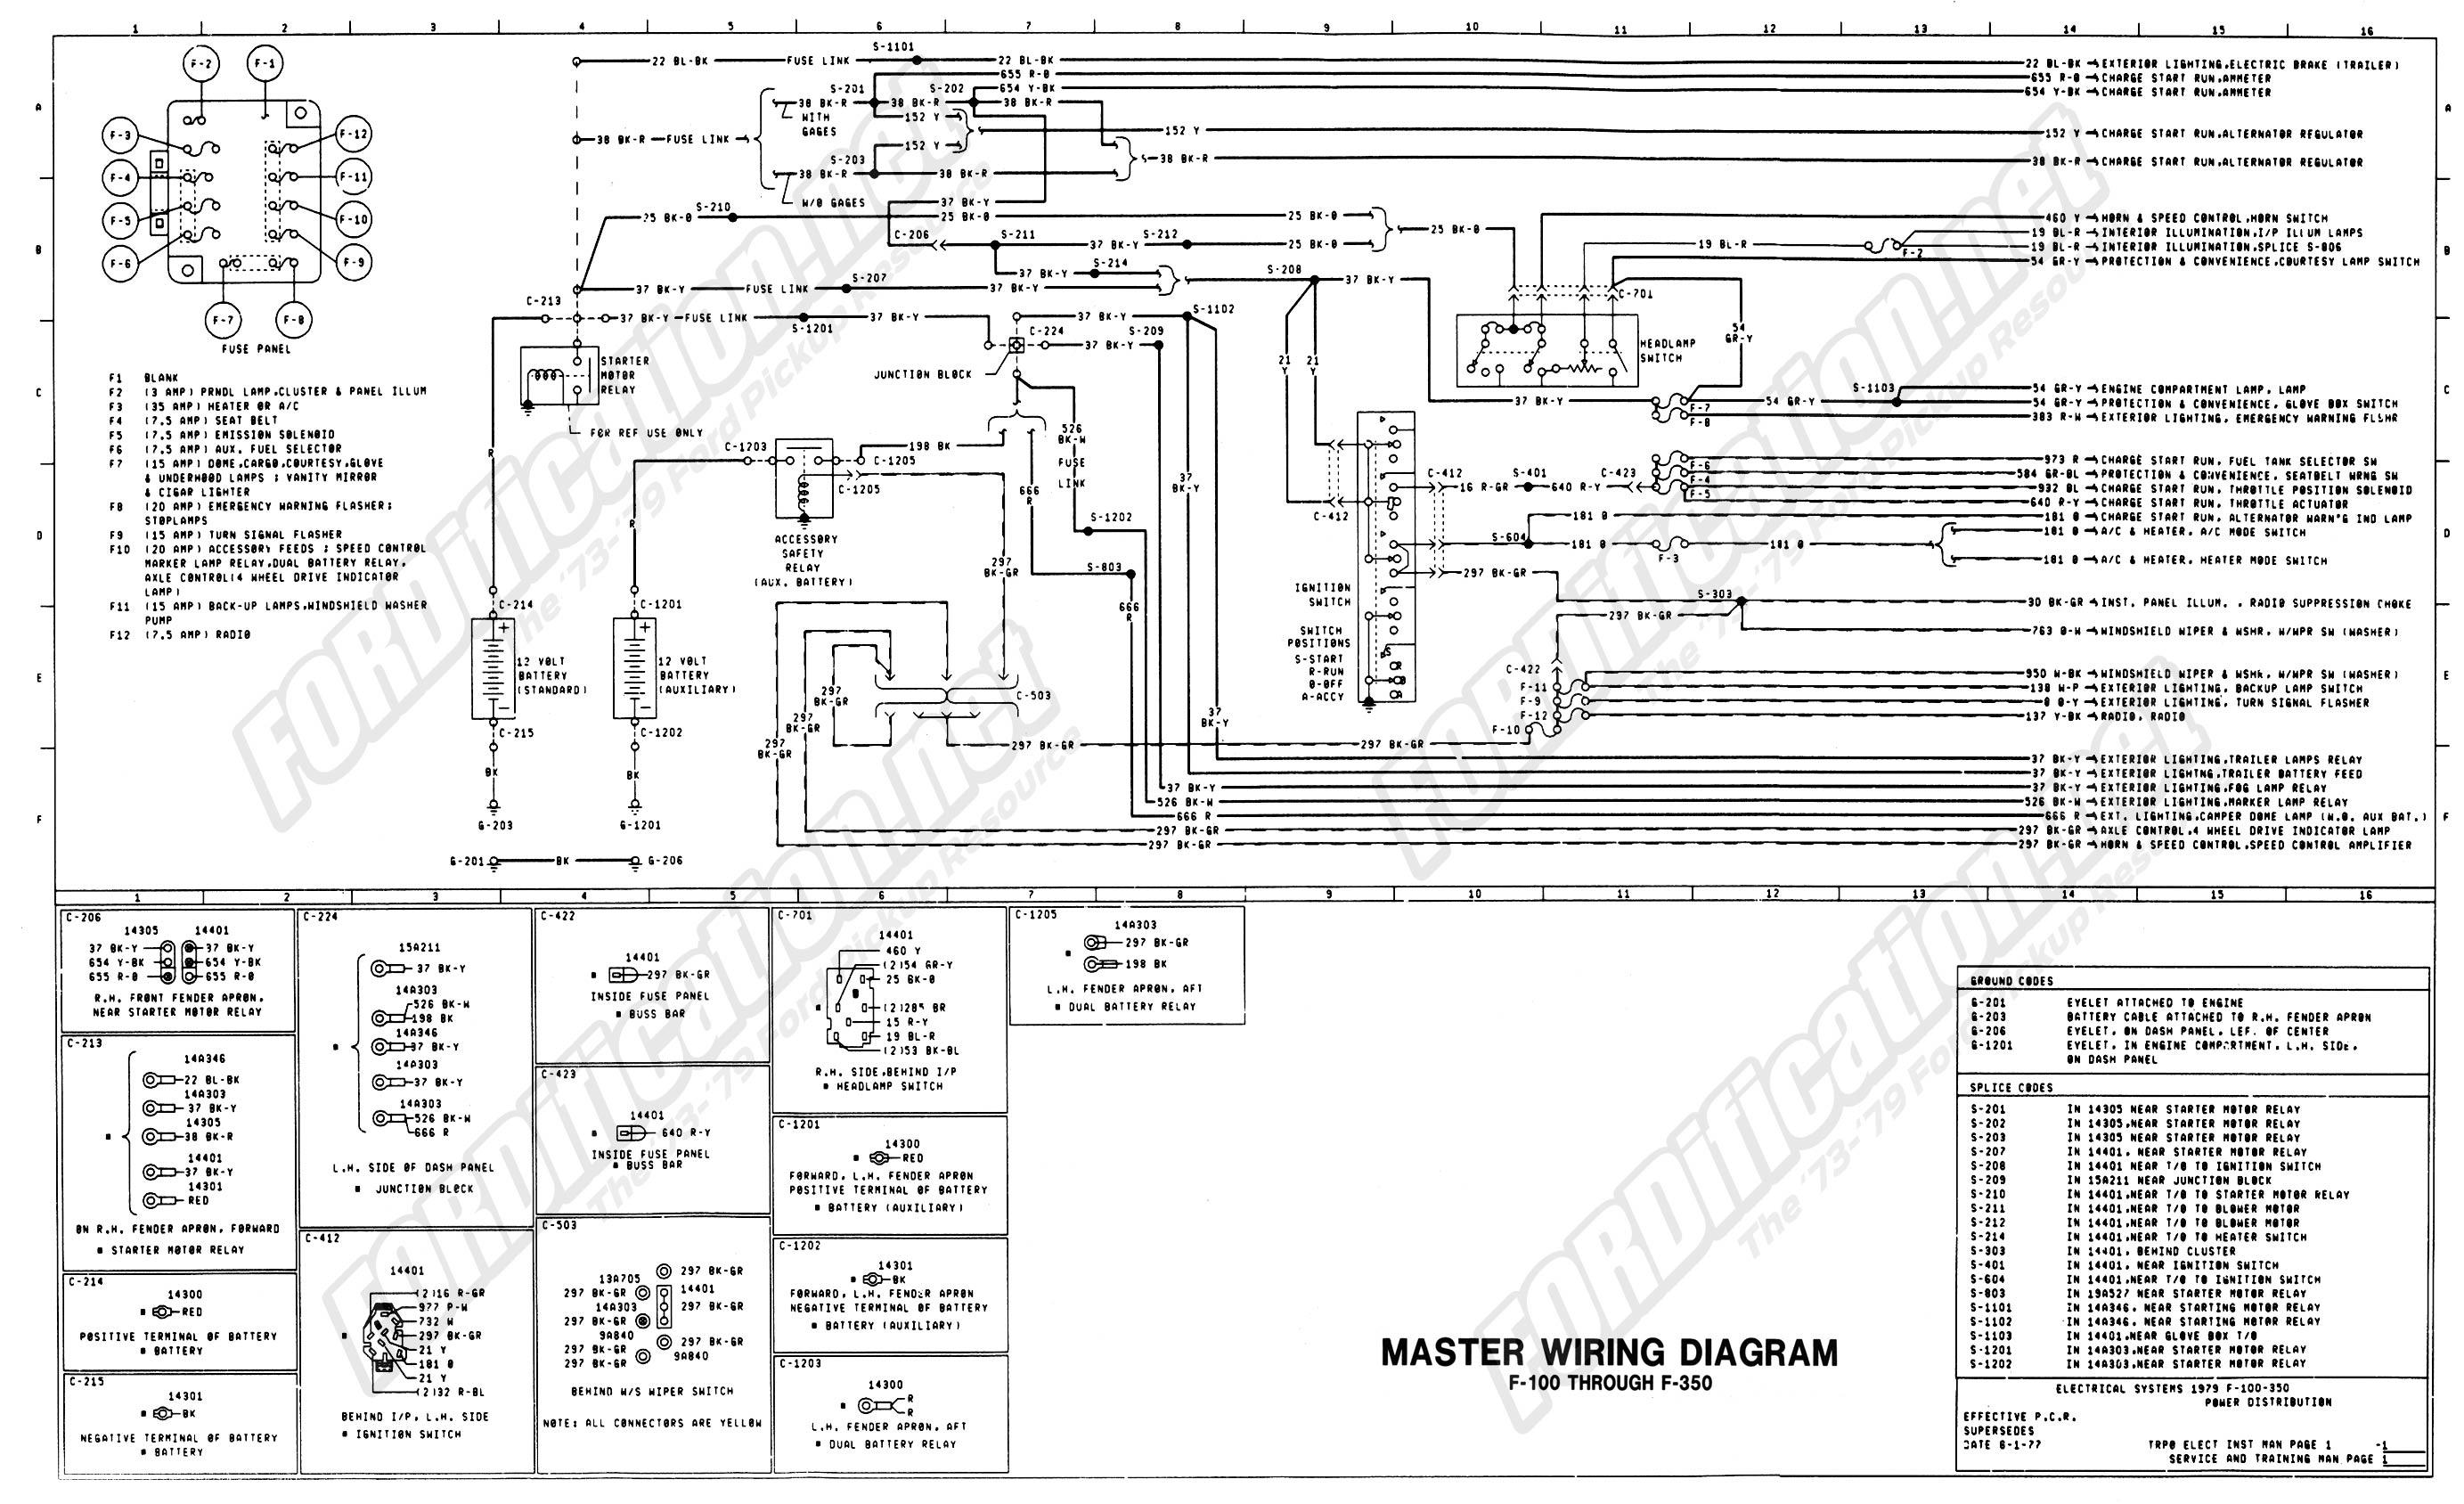 Ford F150 Wiring Harness Diagram | Free Wiring Diagram